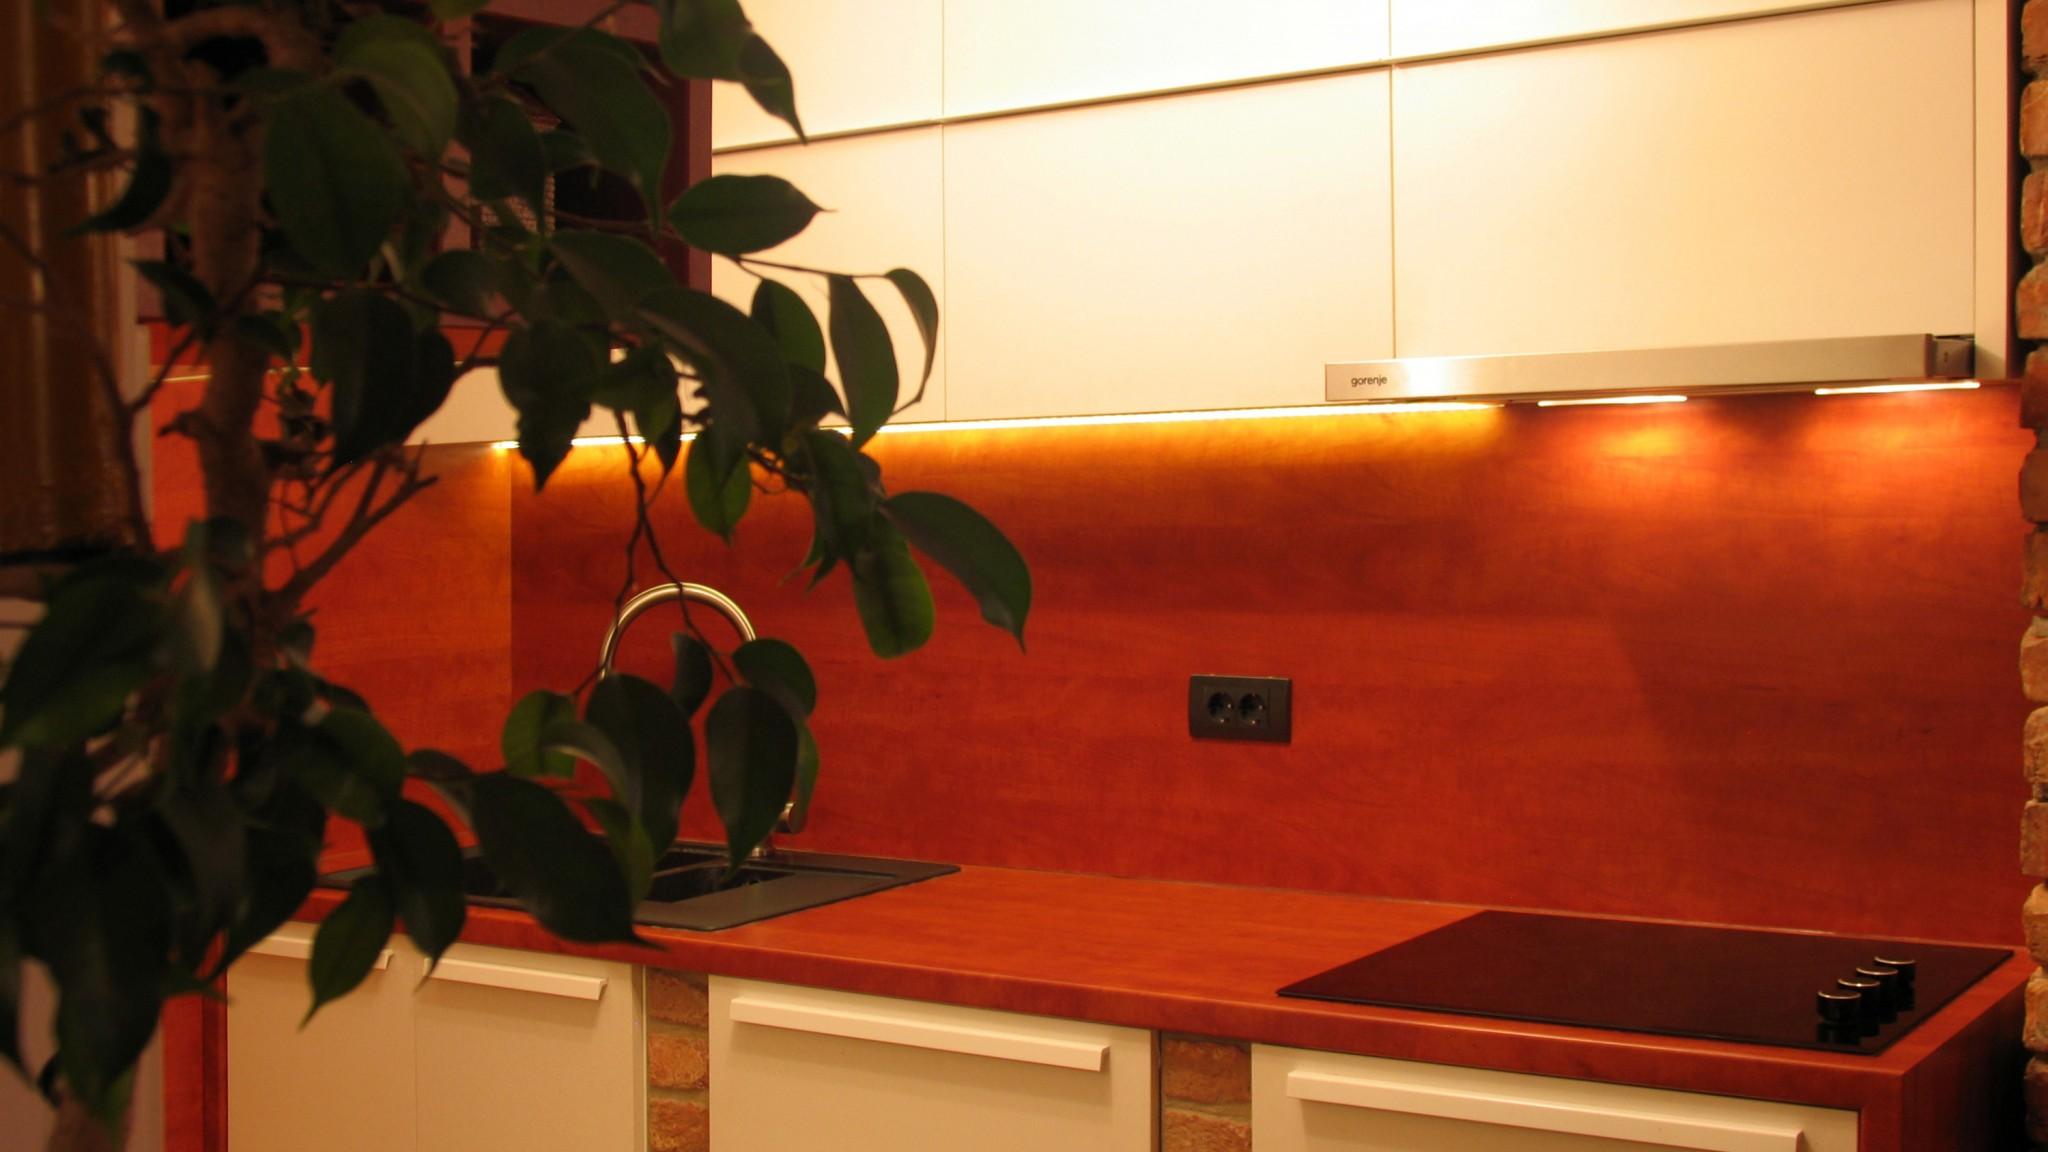 Avala kitchen